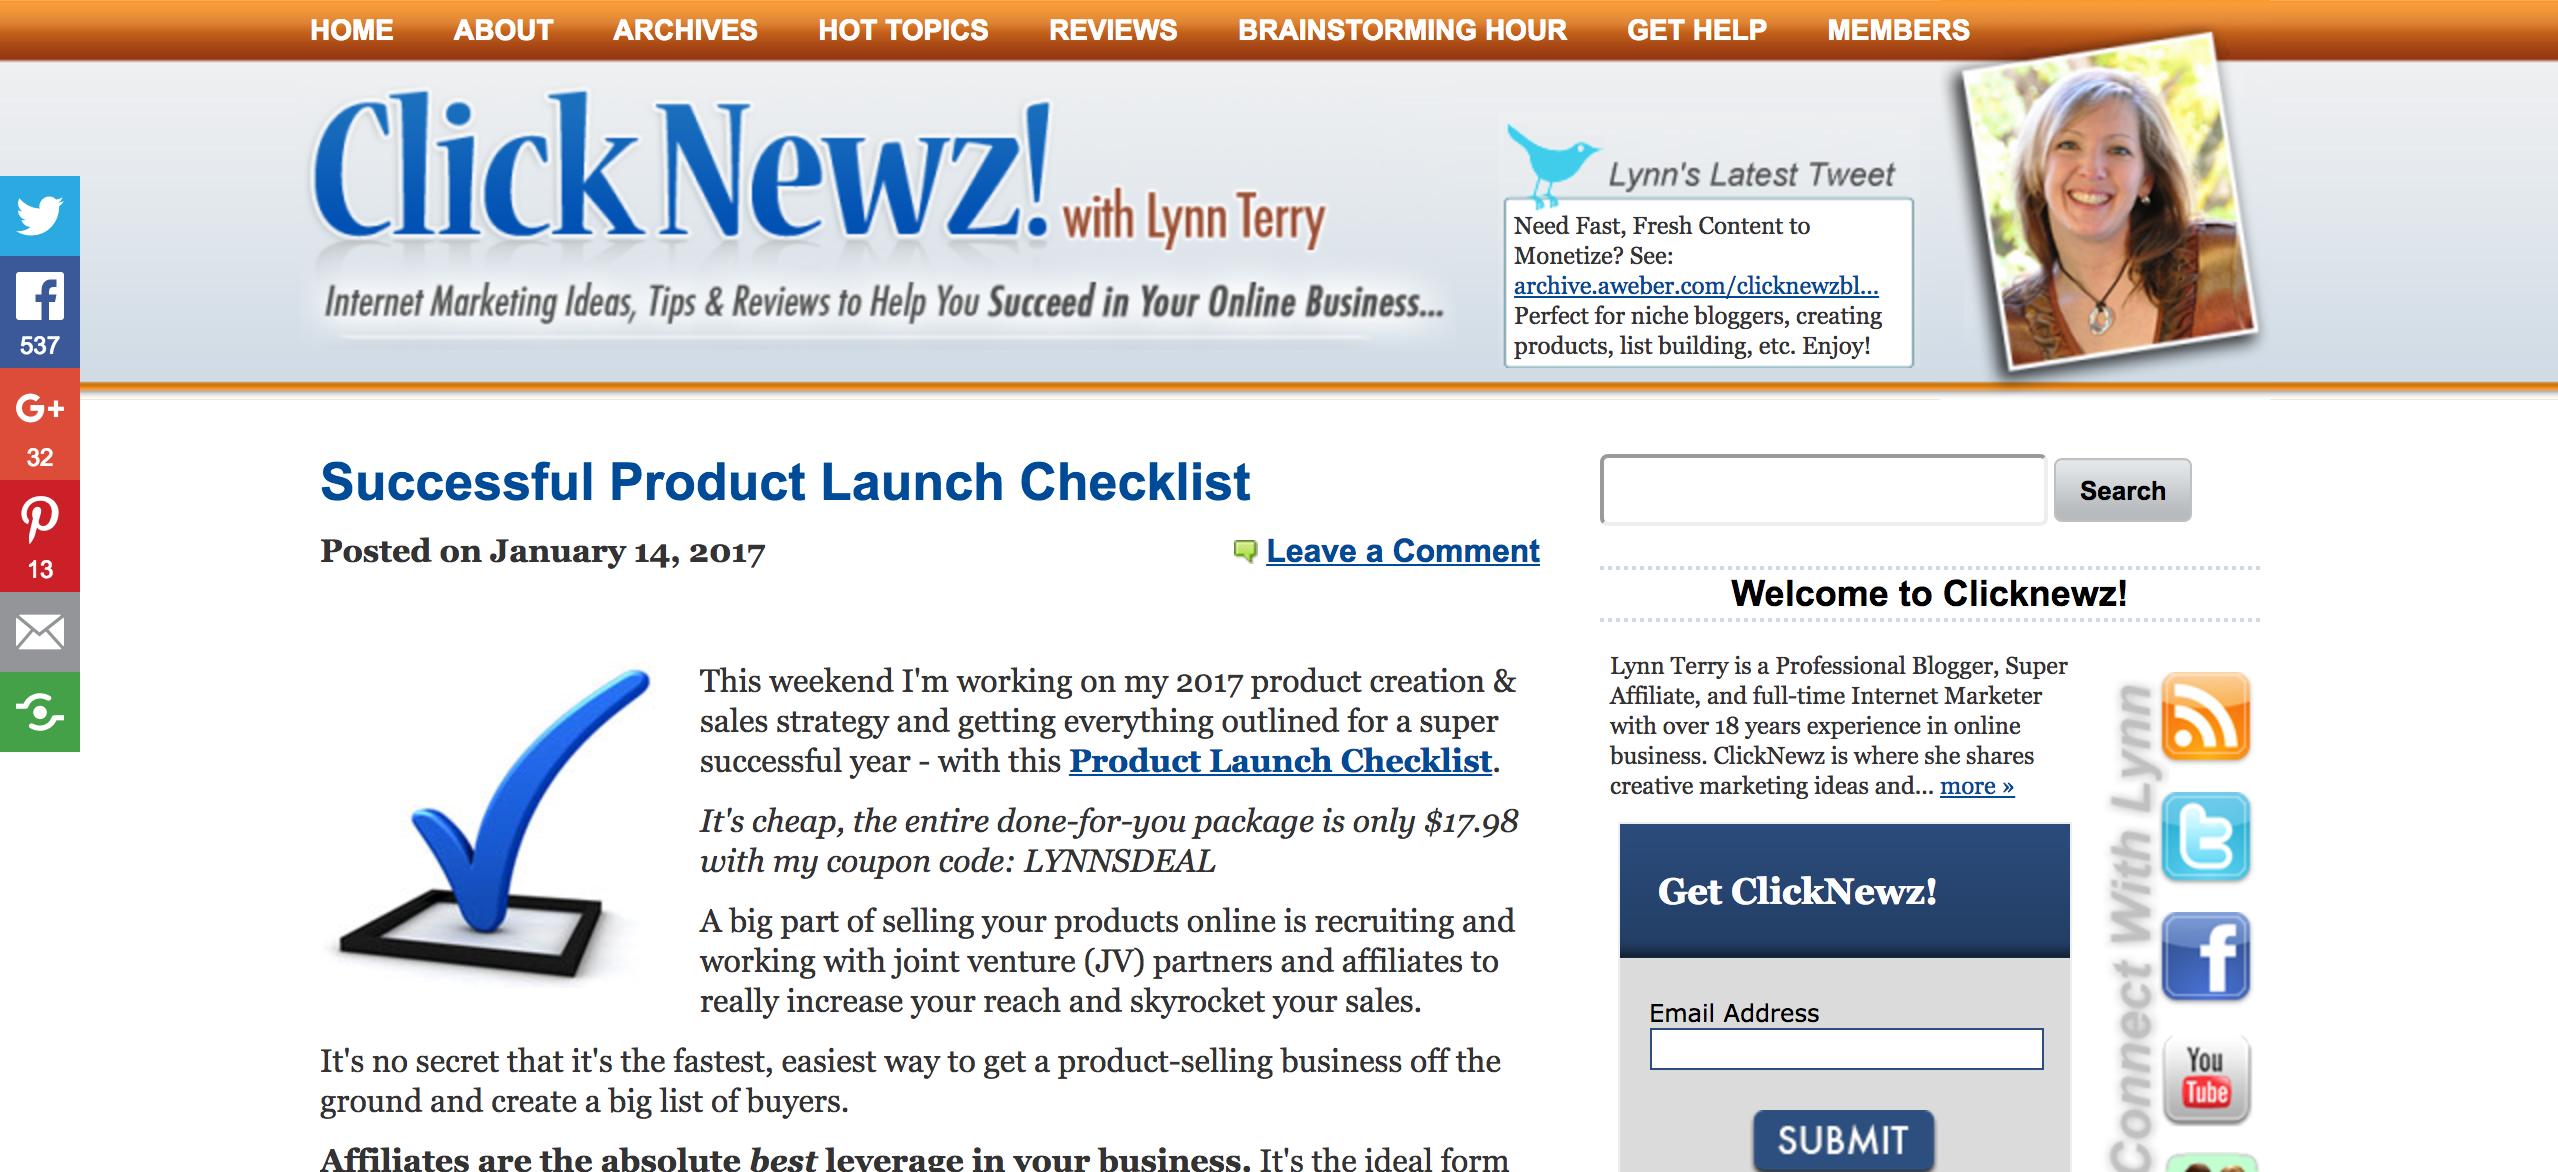 ClickNewz! Internet Marketing Blog